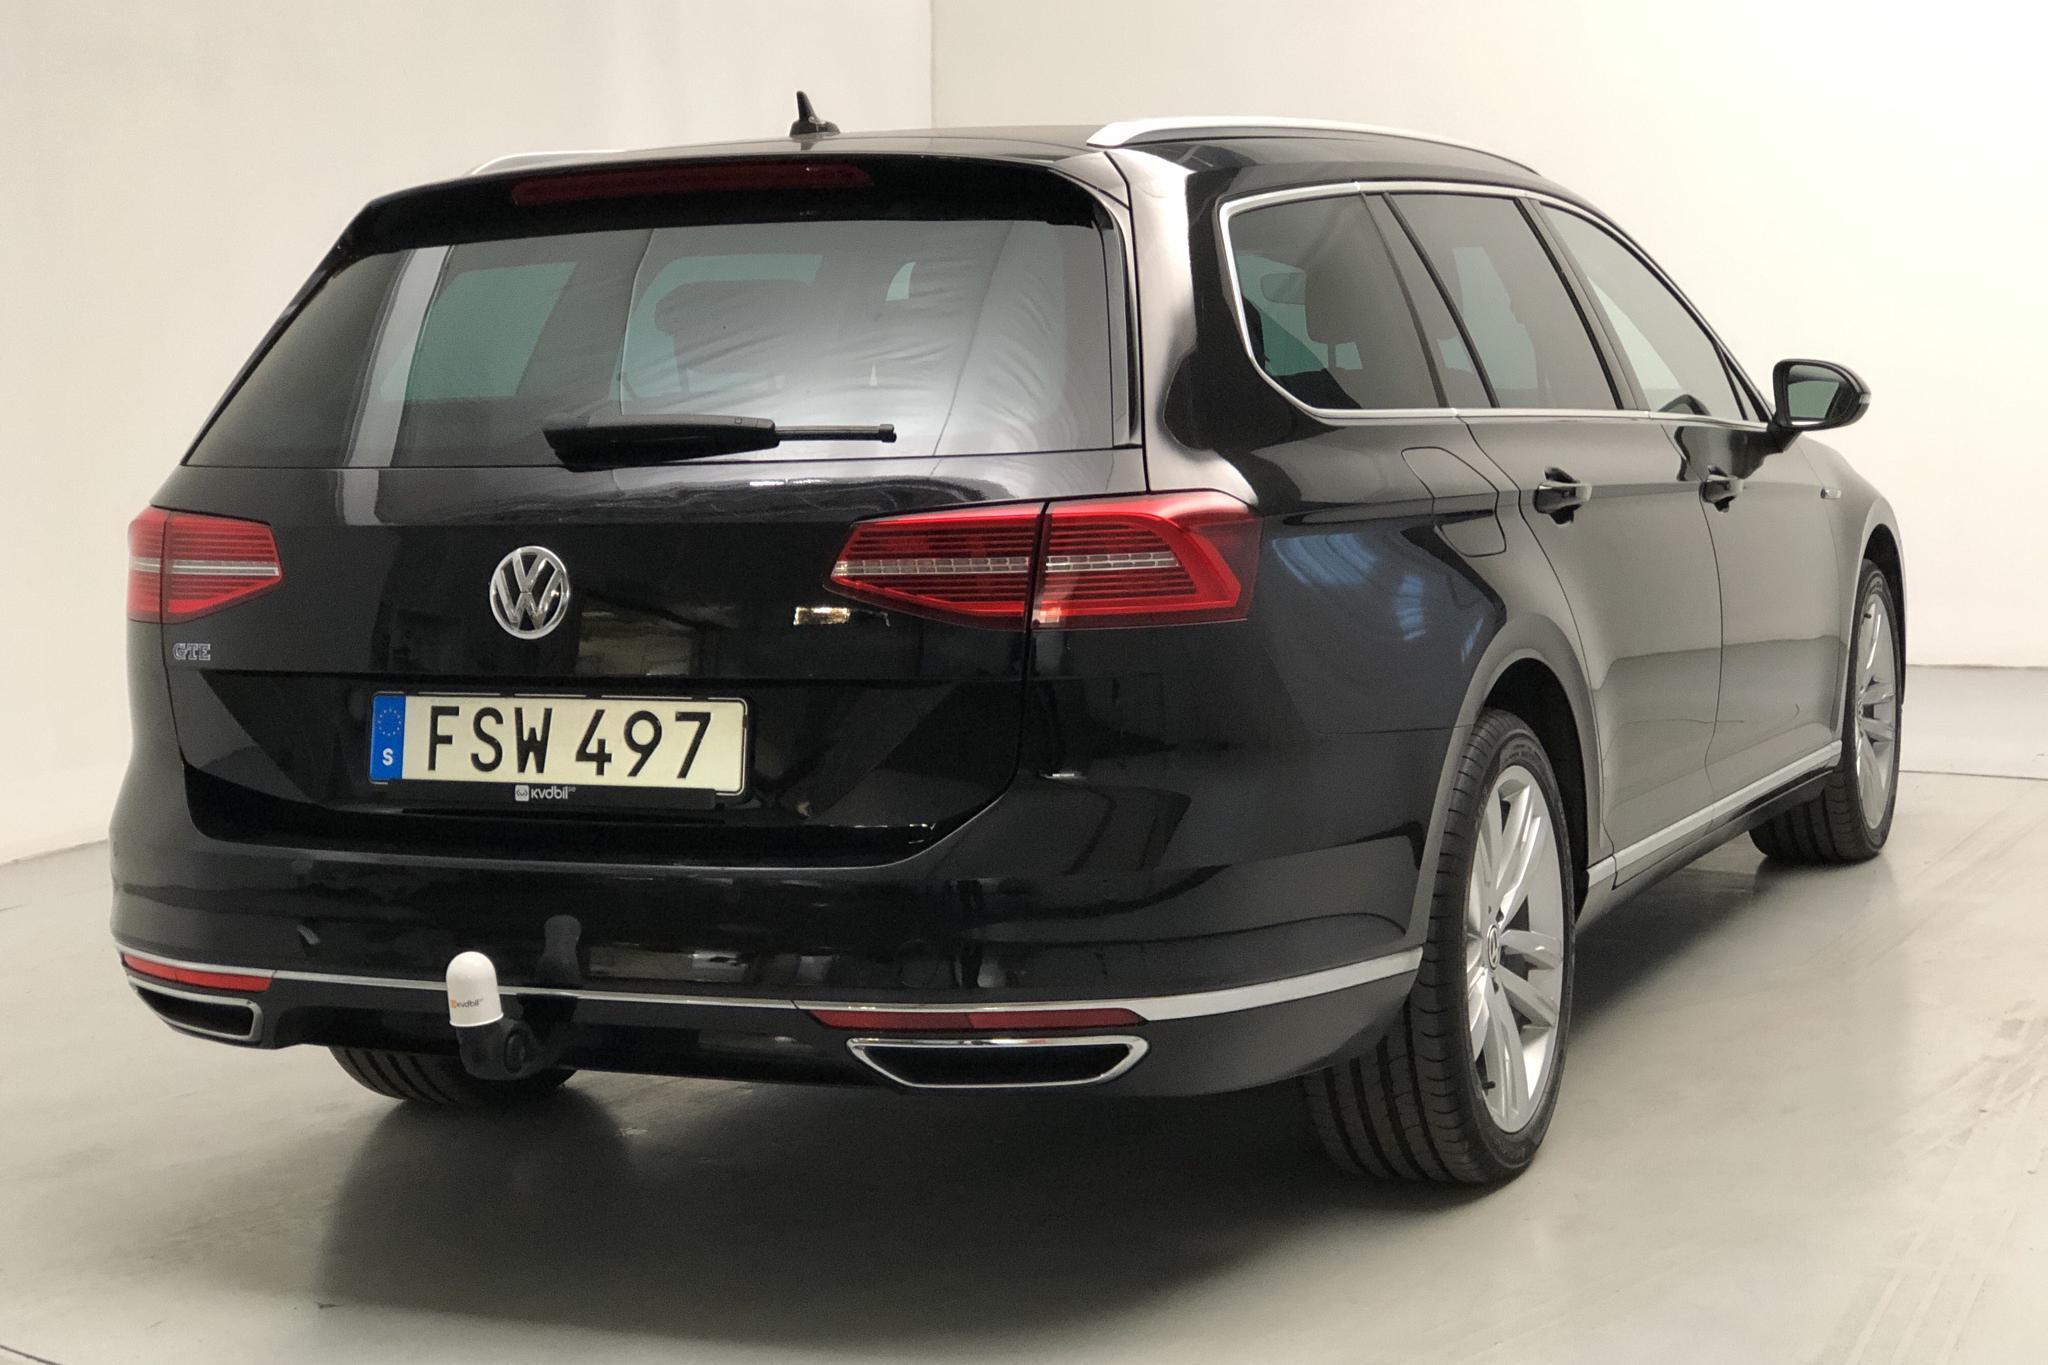 VW Passat 1.4 Plug-in-Hybrid Sportscombi (218hk) - 8 306 mil - Automat - svart - 2018